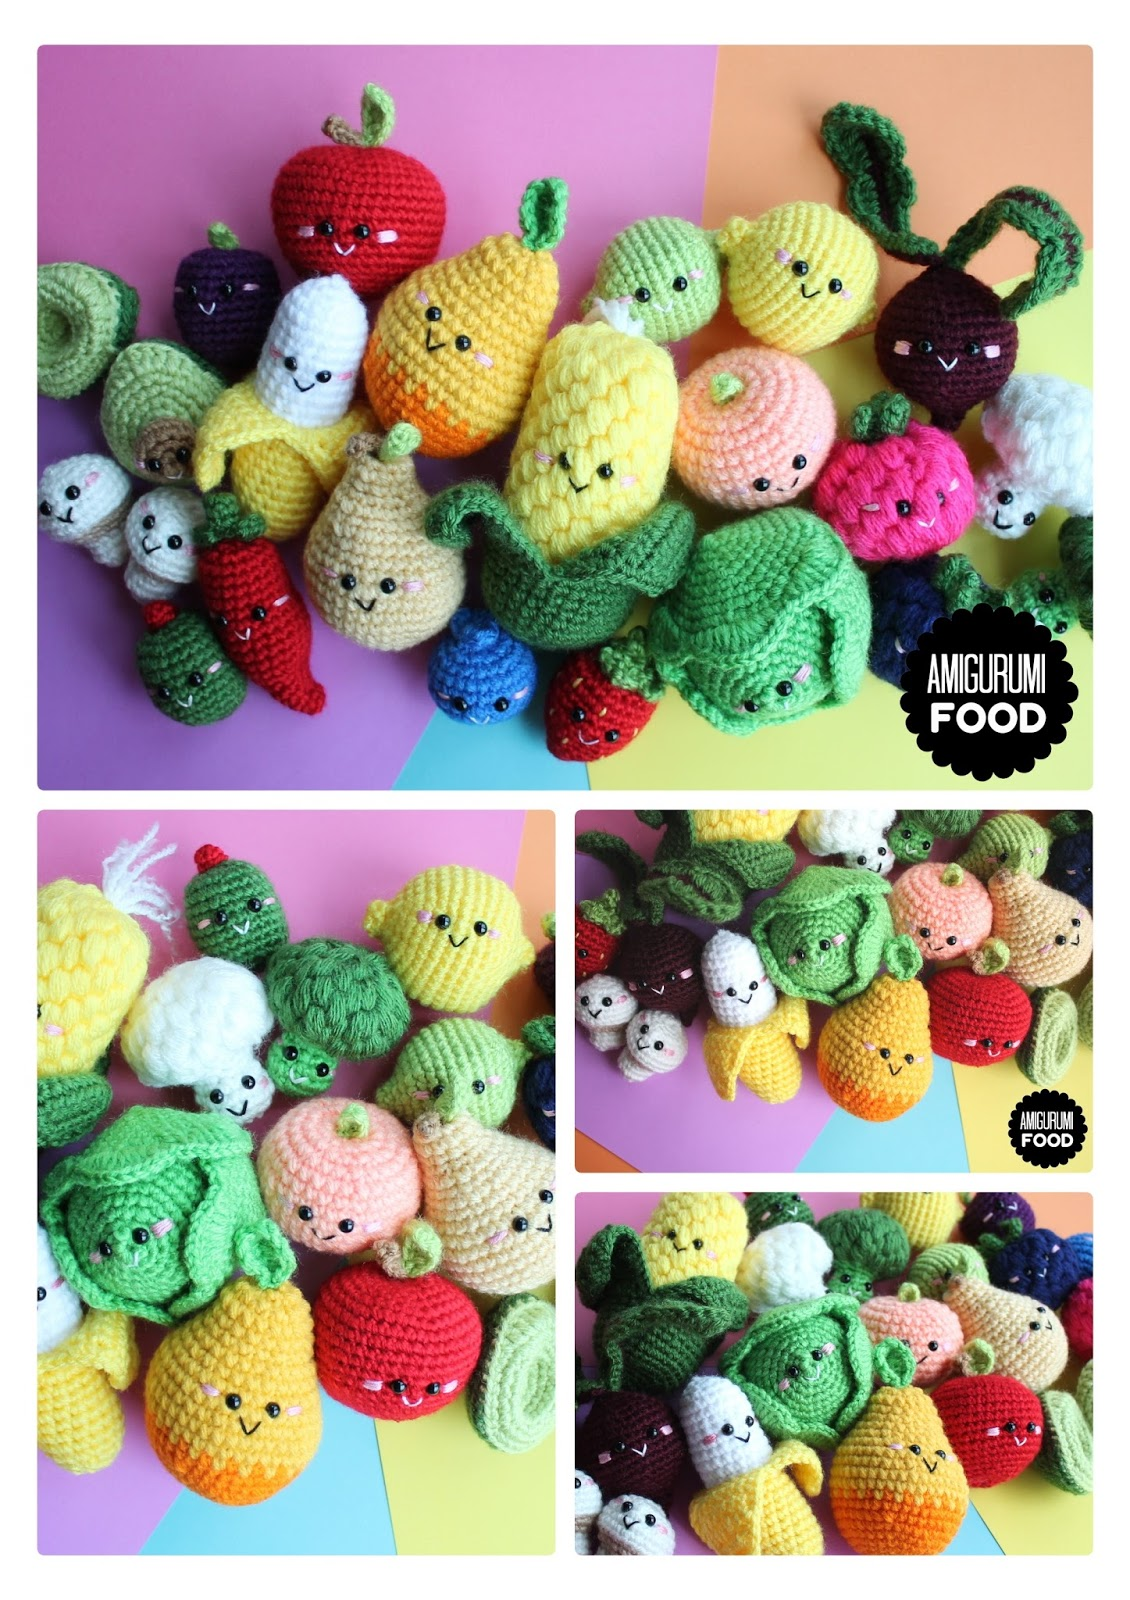 Amazon.com: Crochet Food. 35 Crochet Patterns of Fruits and ... | 1600x1130